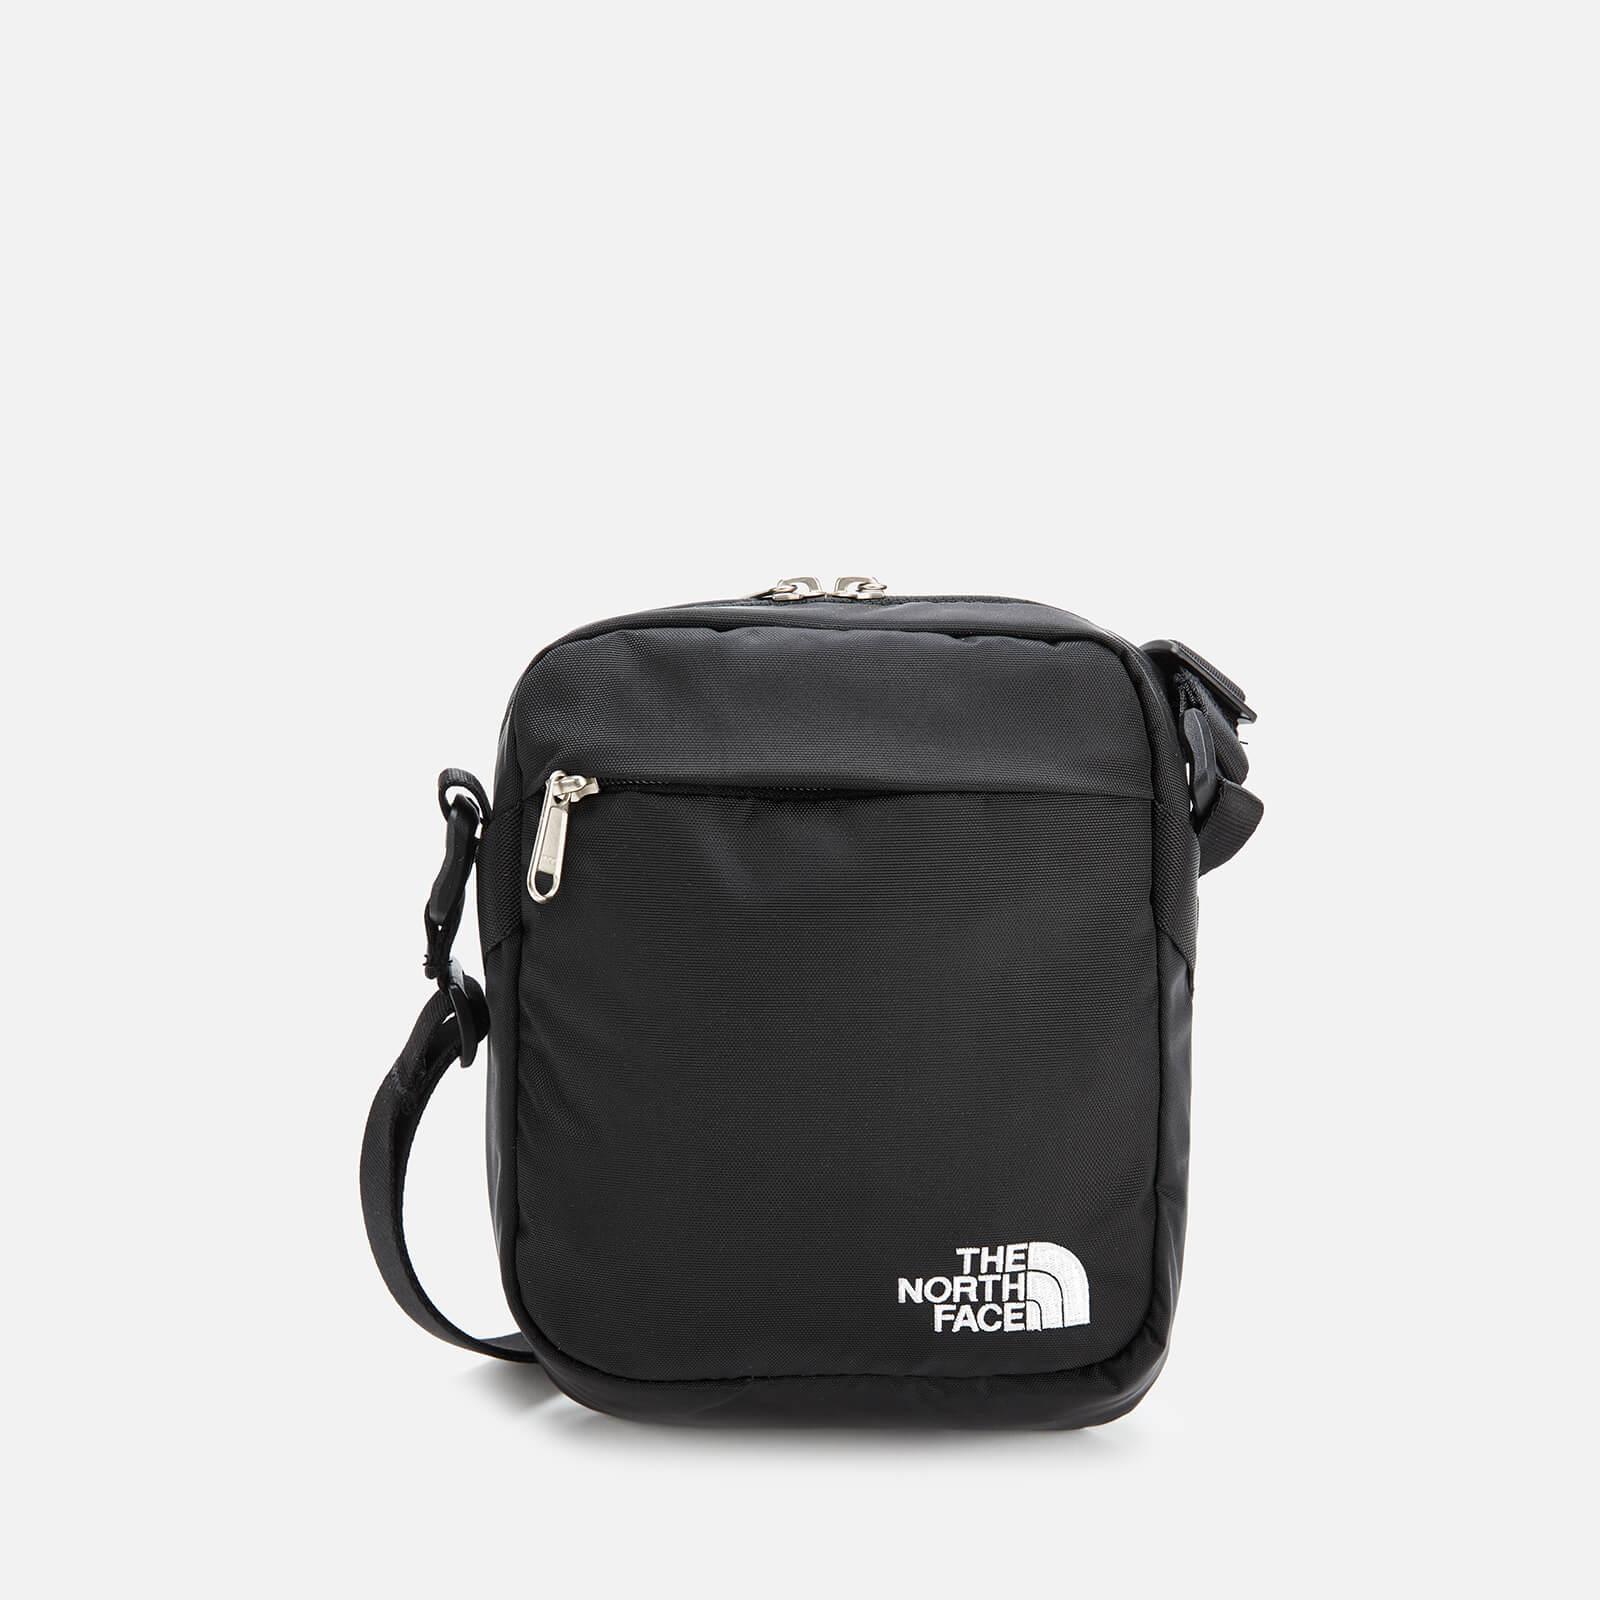 ff07b5dbd The North Face Men's Convertible Shoulder Bag - TNF Black